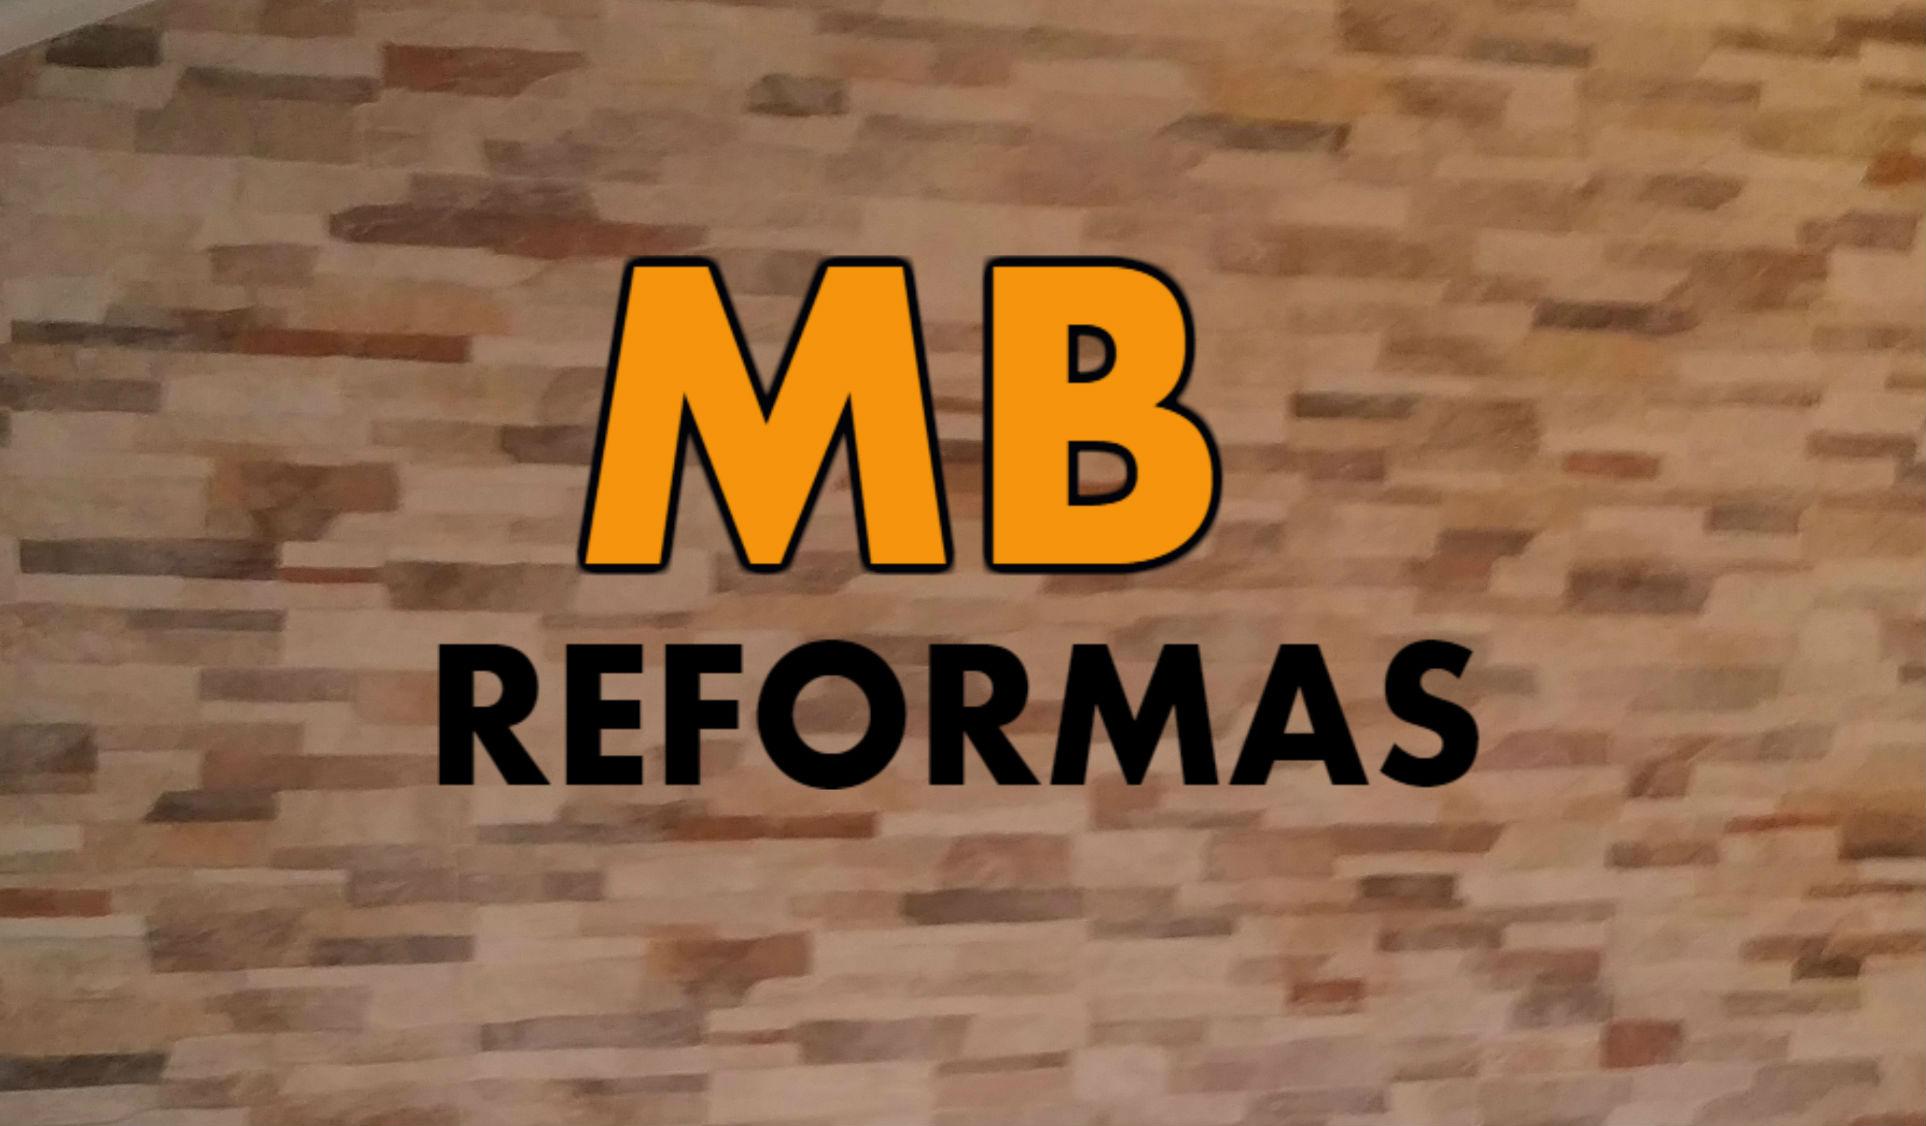 Reformasmb